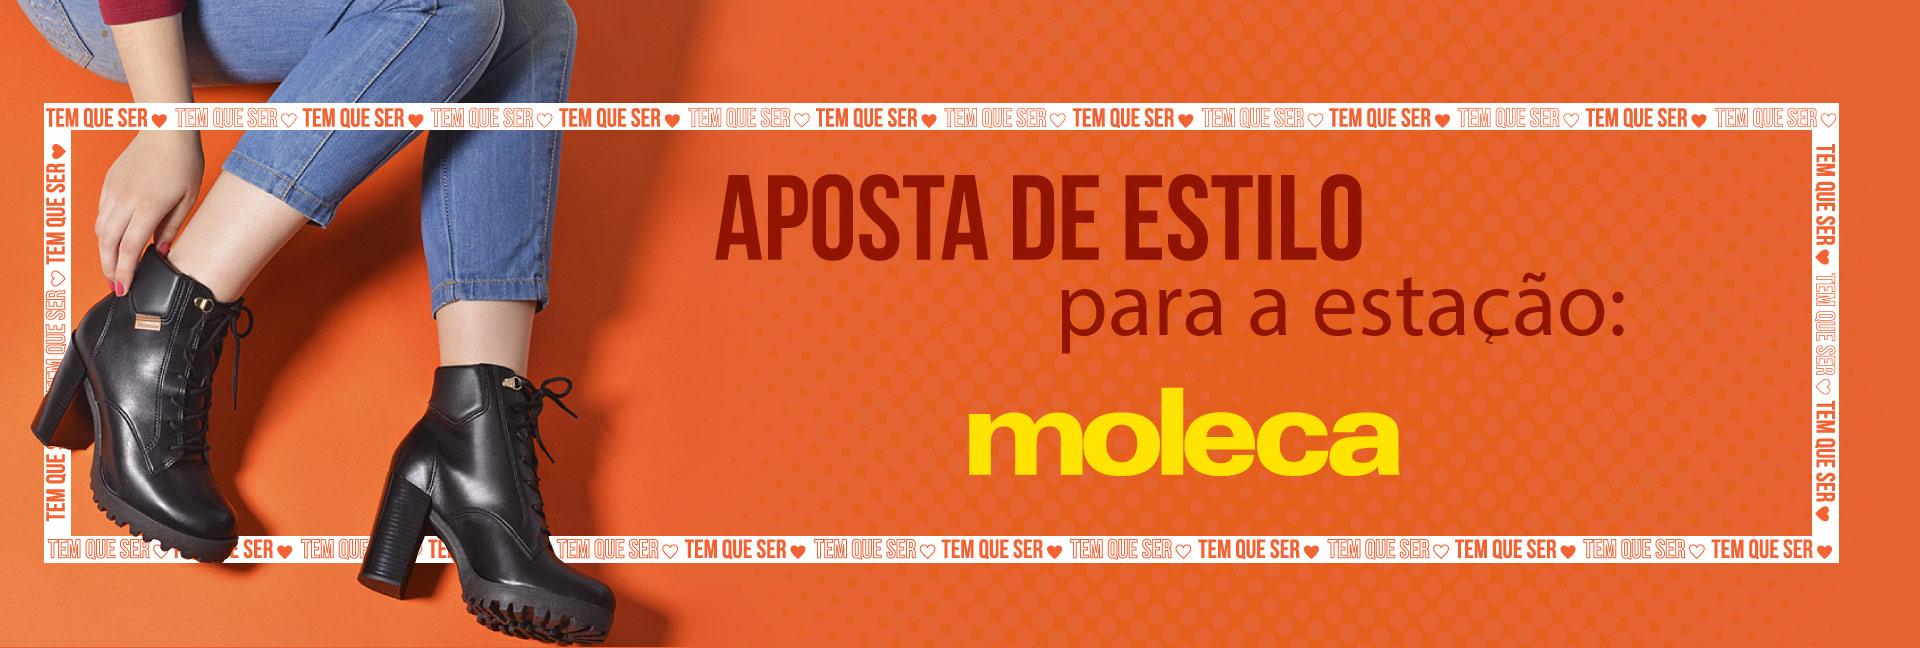 Banner Moleca Teste